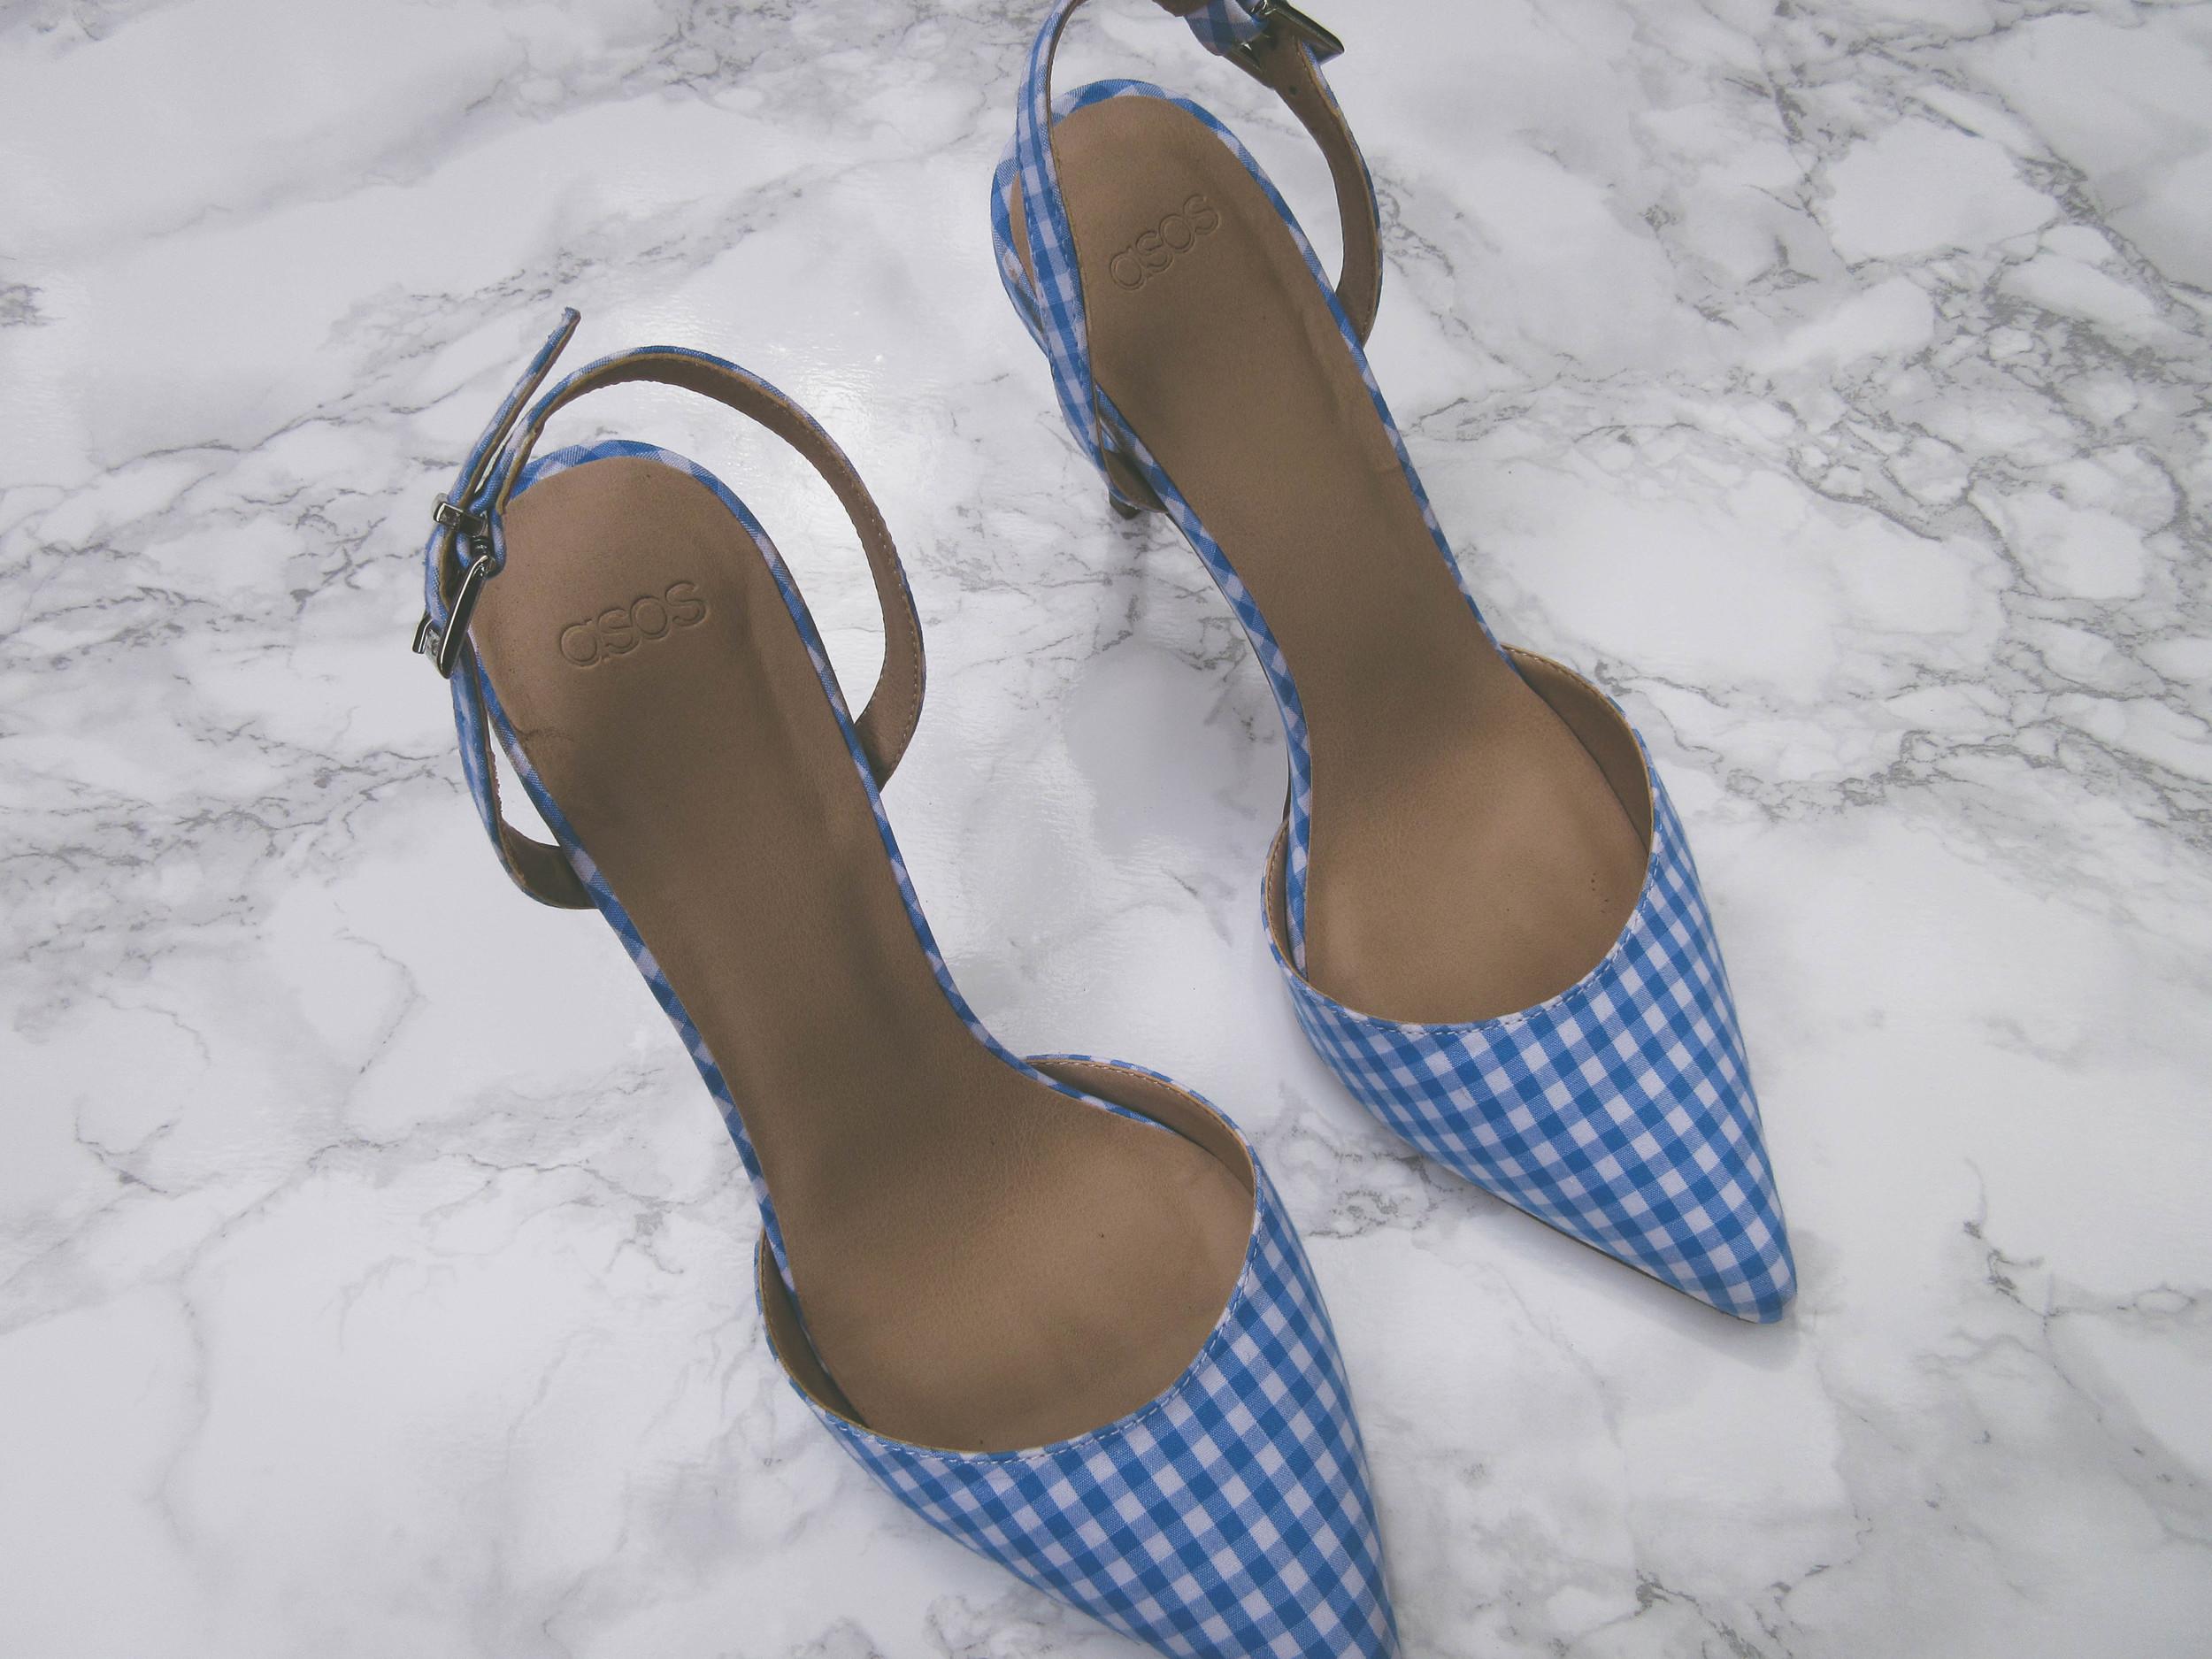 Asos Pyramid heels , $51